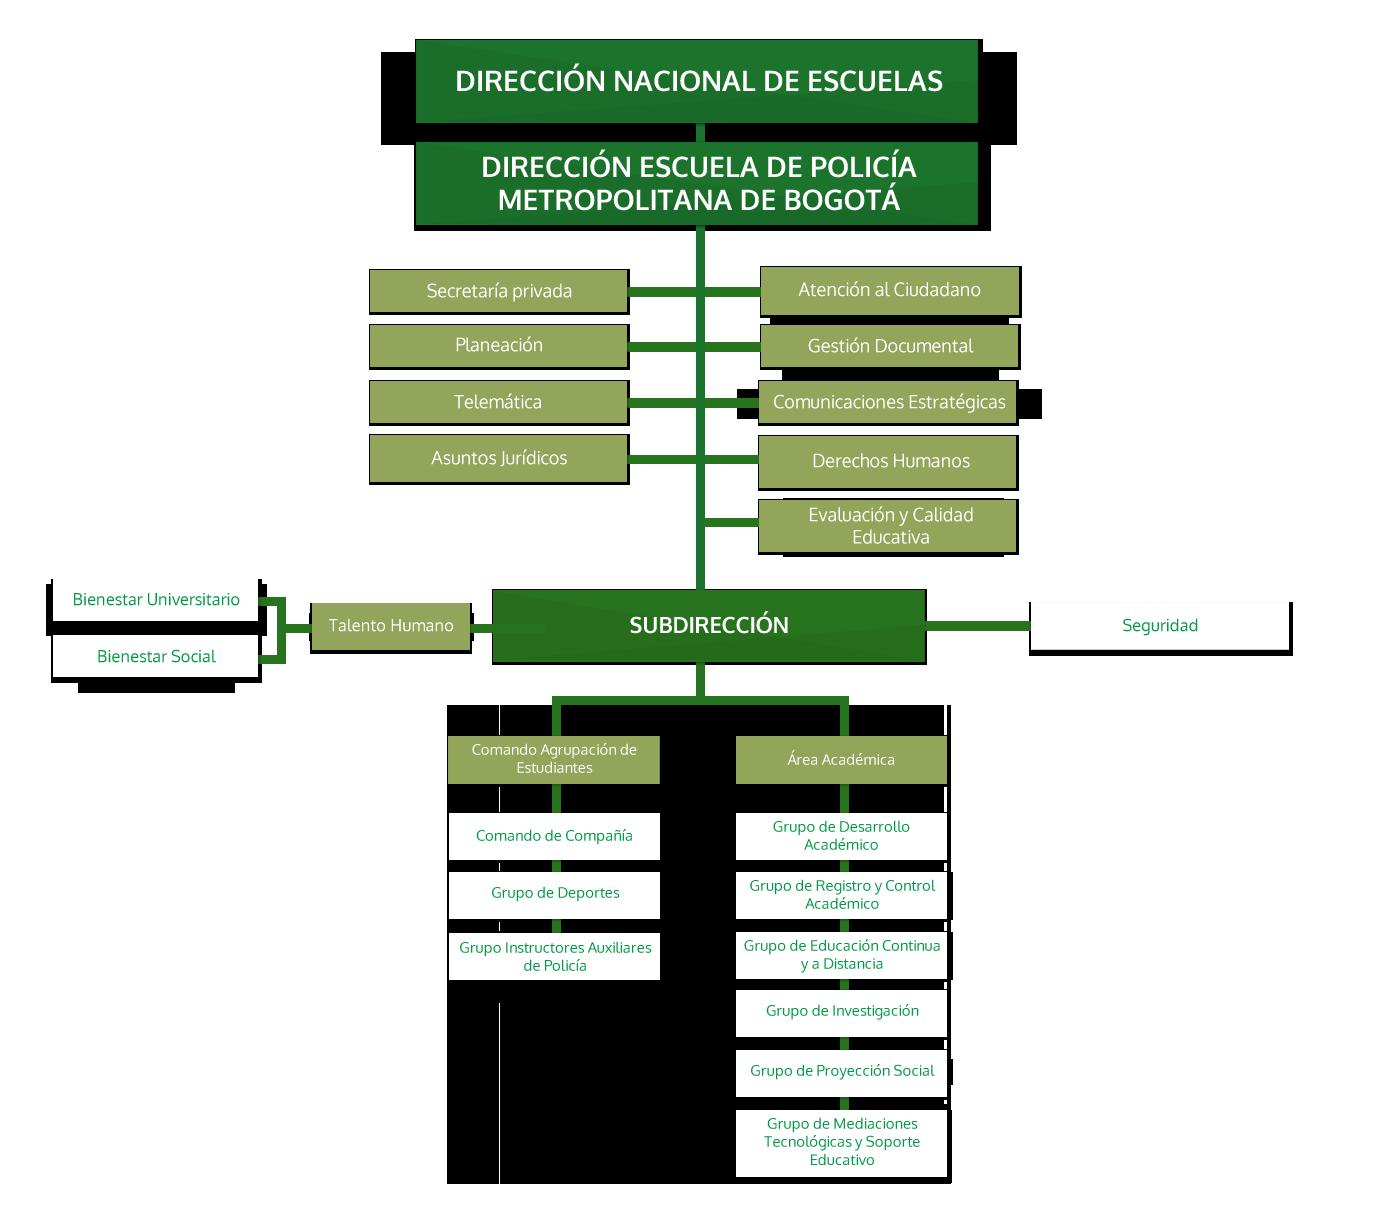 Escuela Metropolitana de Bogota